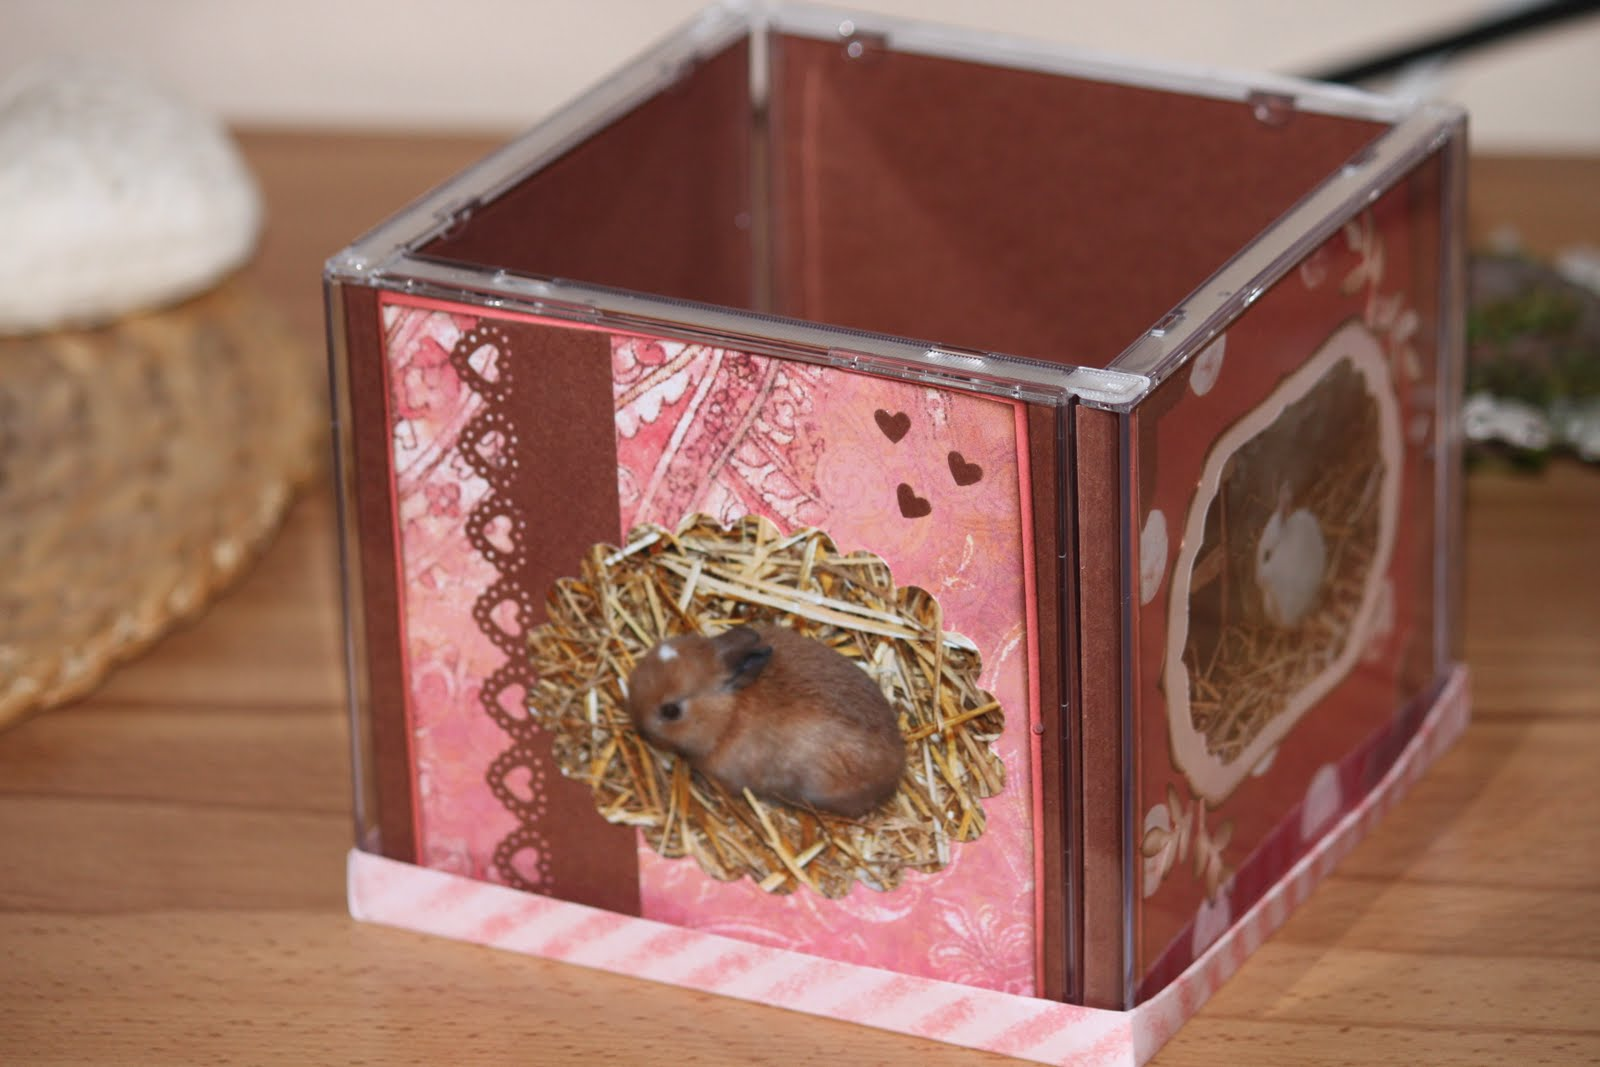 mimis bastelseite foto w rfel aus cd h llen. Black Bedroom Furniture Sets. Home Design Ideas